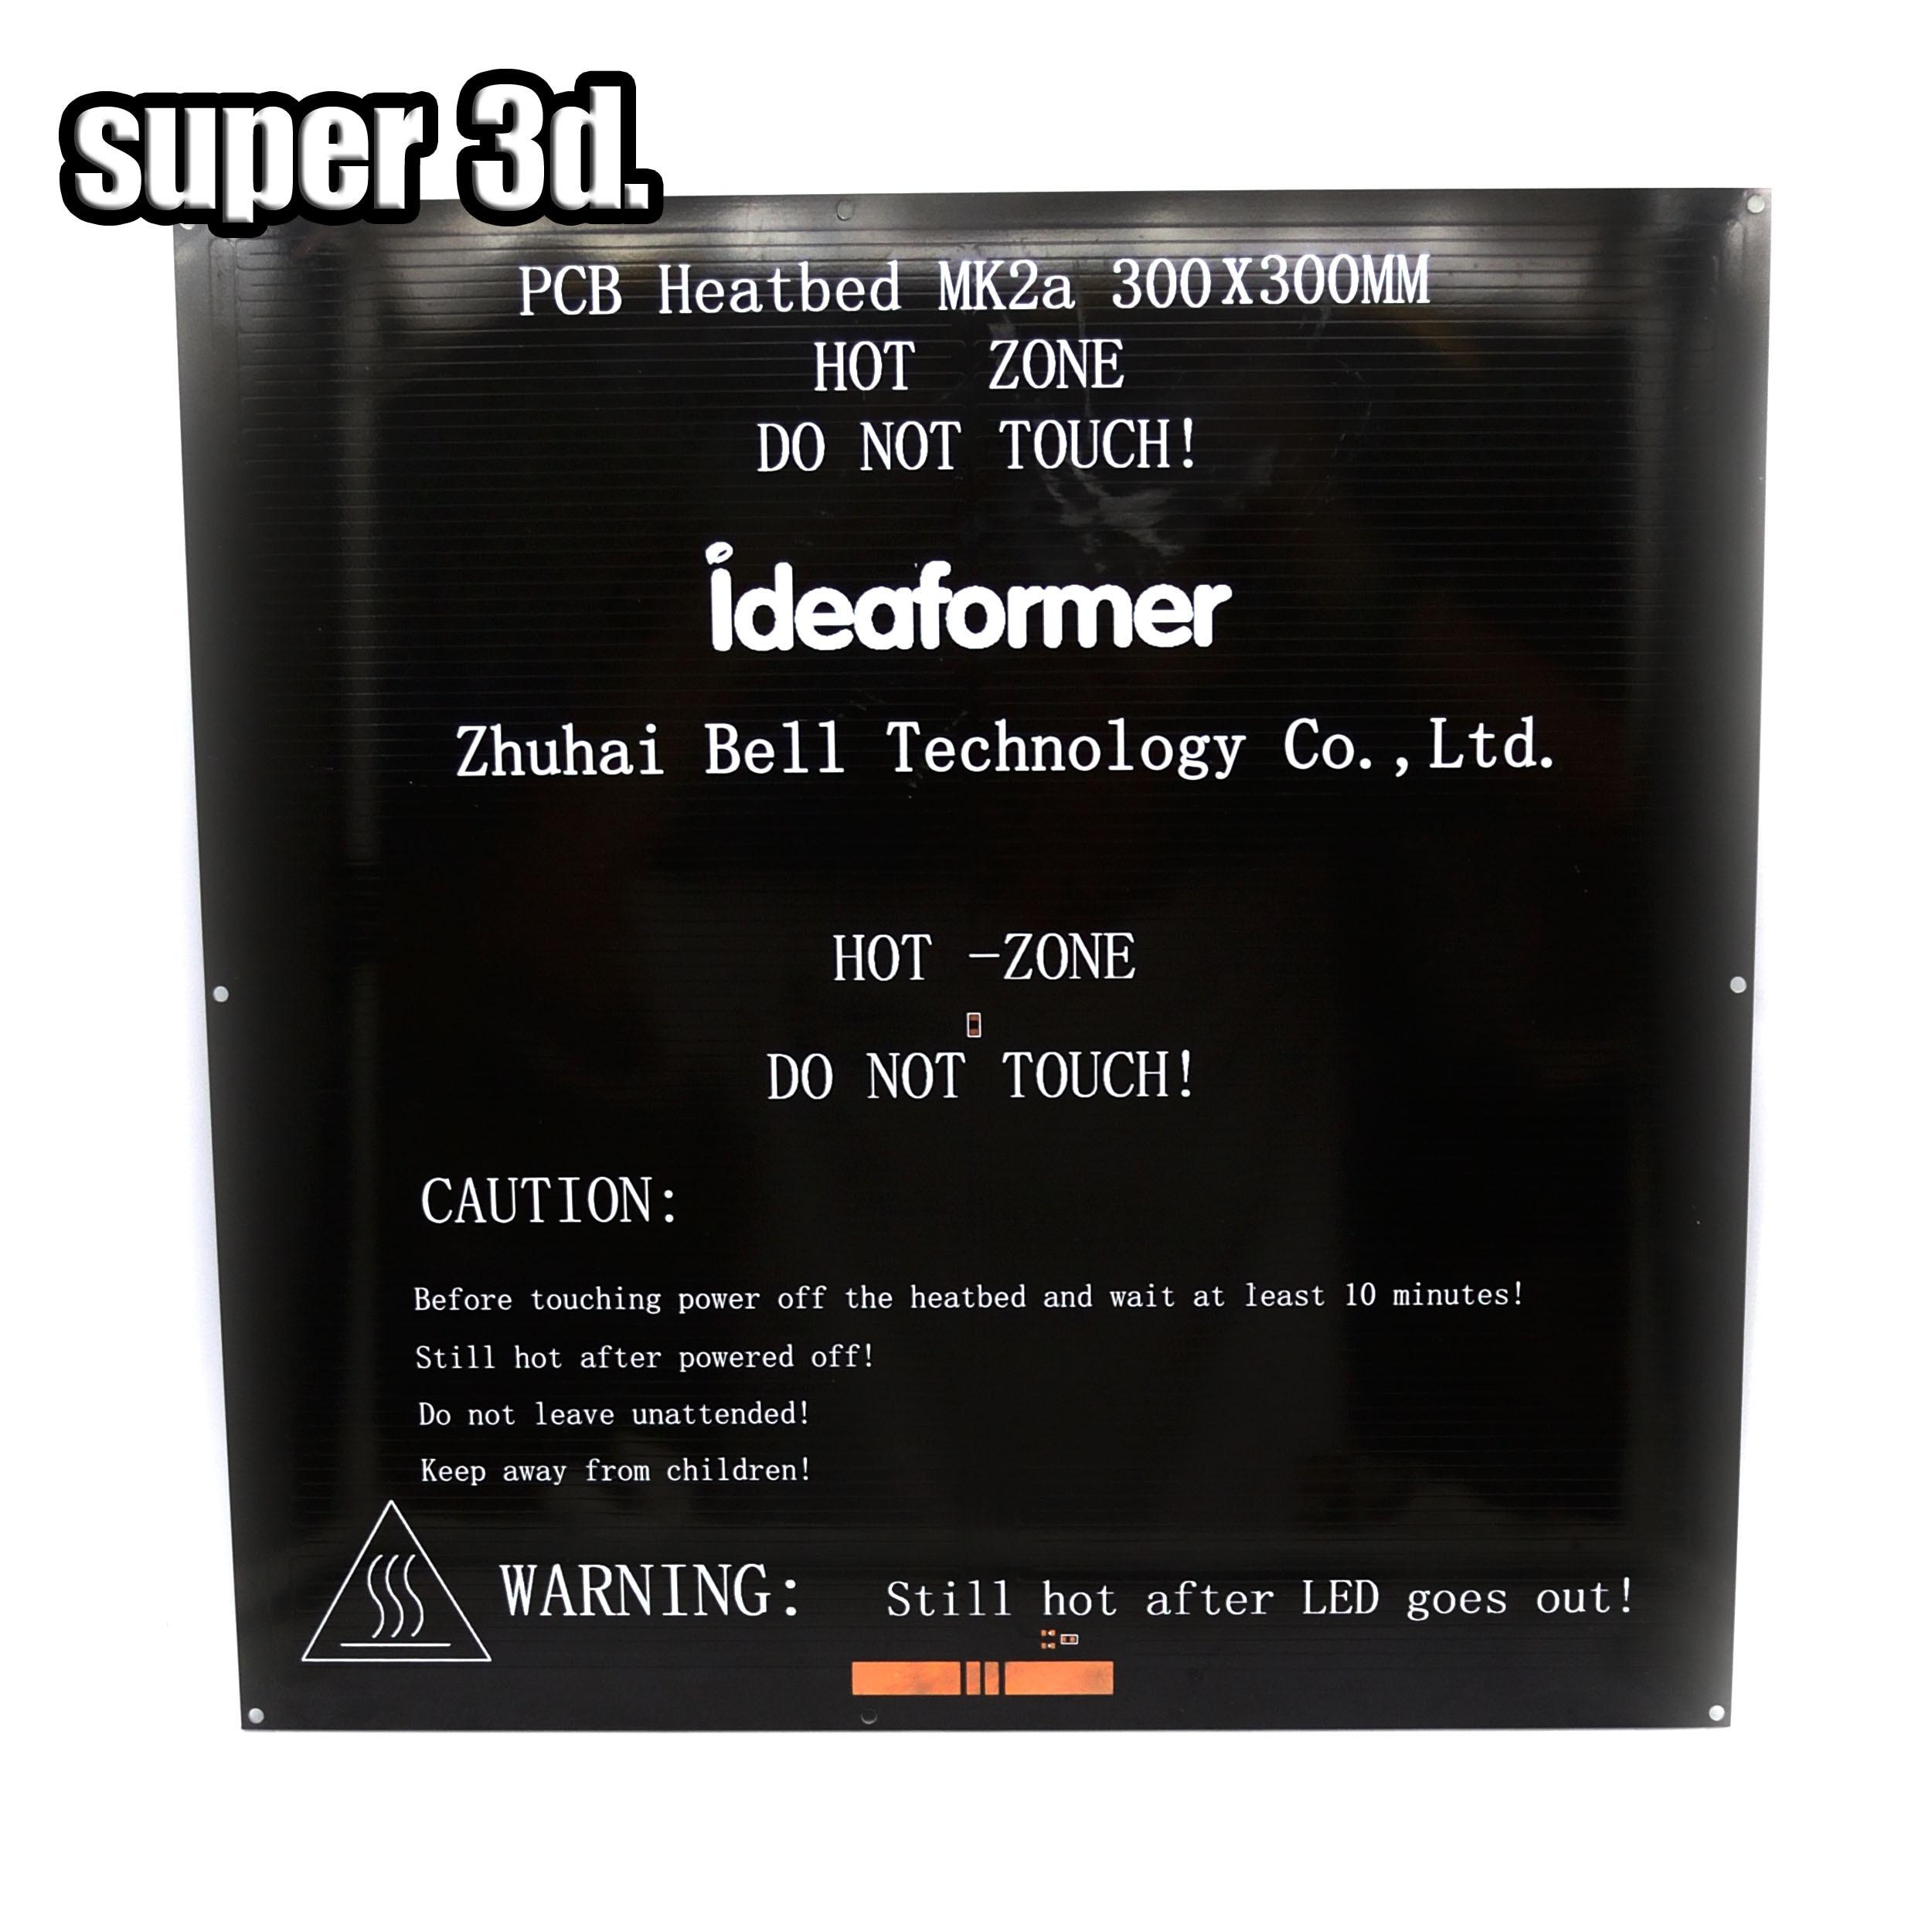 Impresora 3D heatbed MK2a PCB placa de aluminio estándar cama cama Caliente 300*